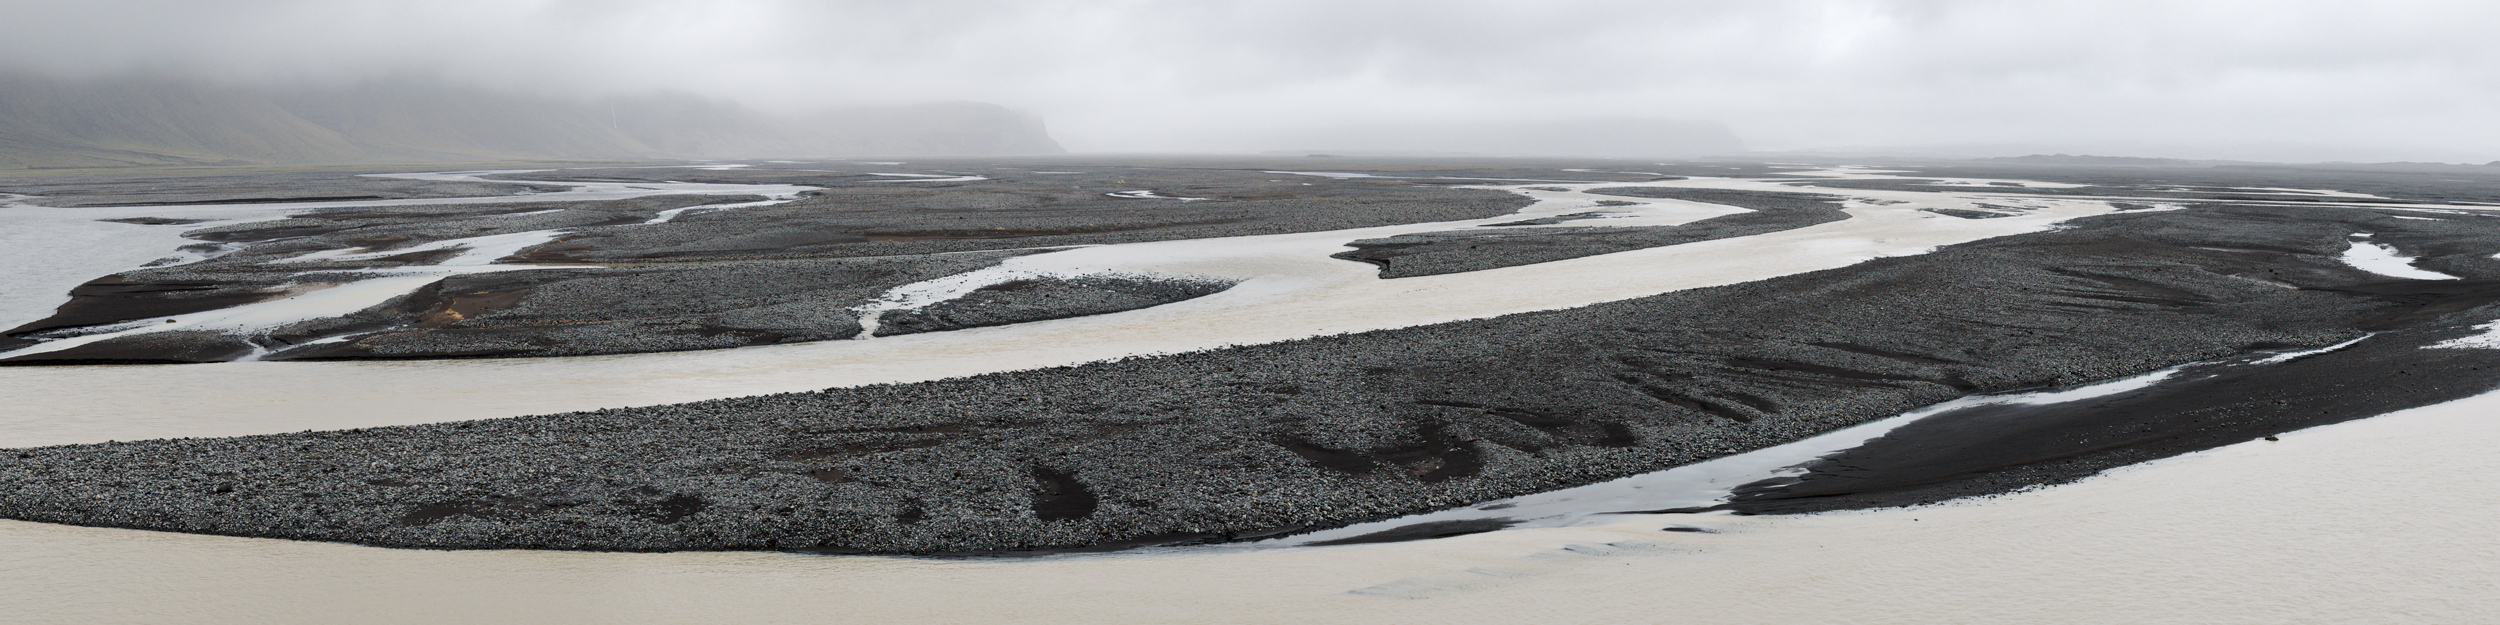 islande_skeidararsandur_01